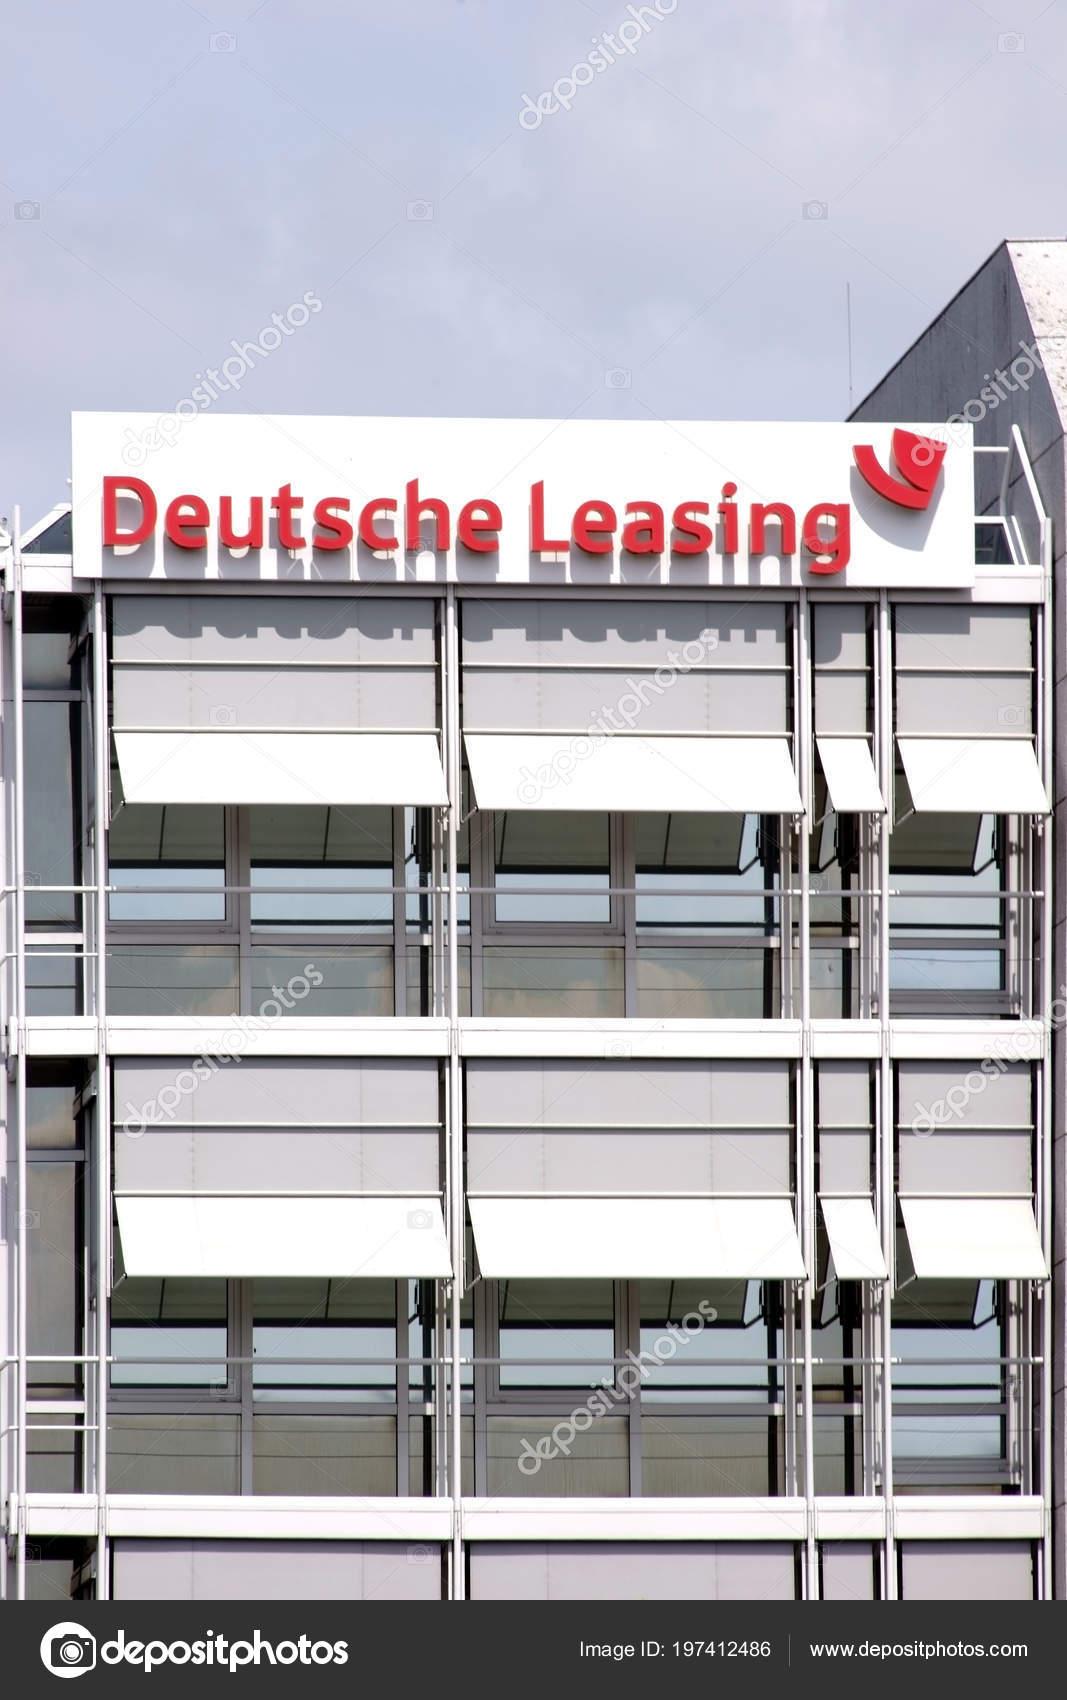 Deutsche Leasing Bad Homburg Facade Corporate Headquarters